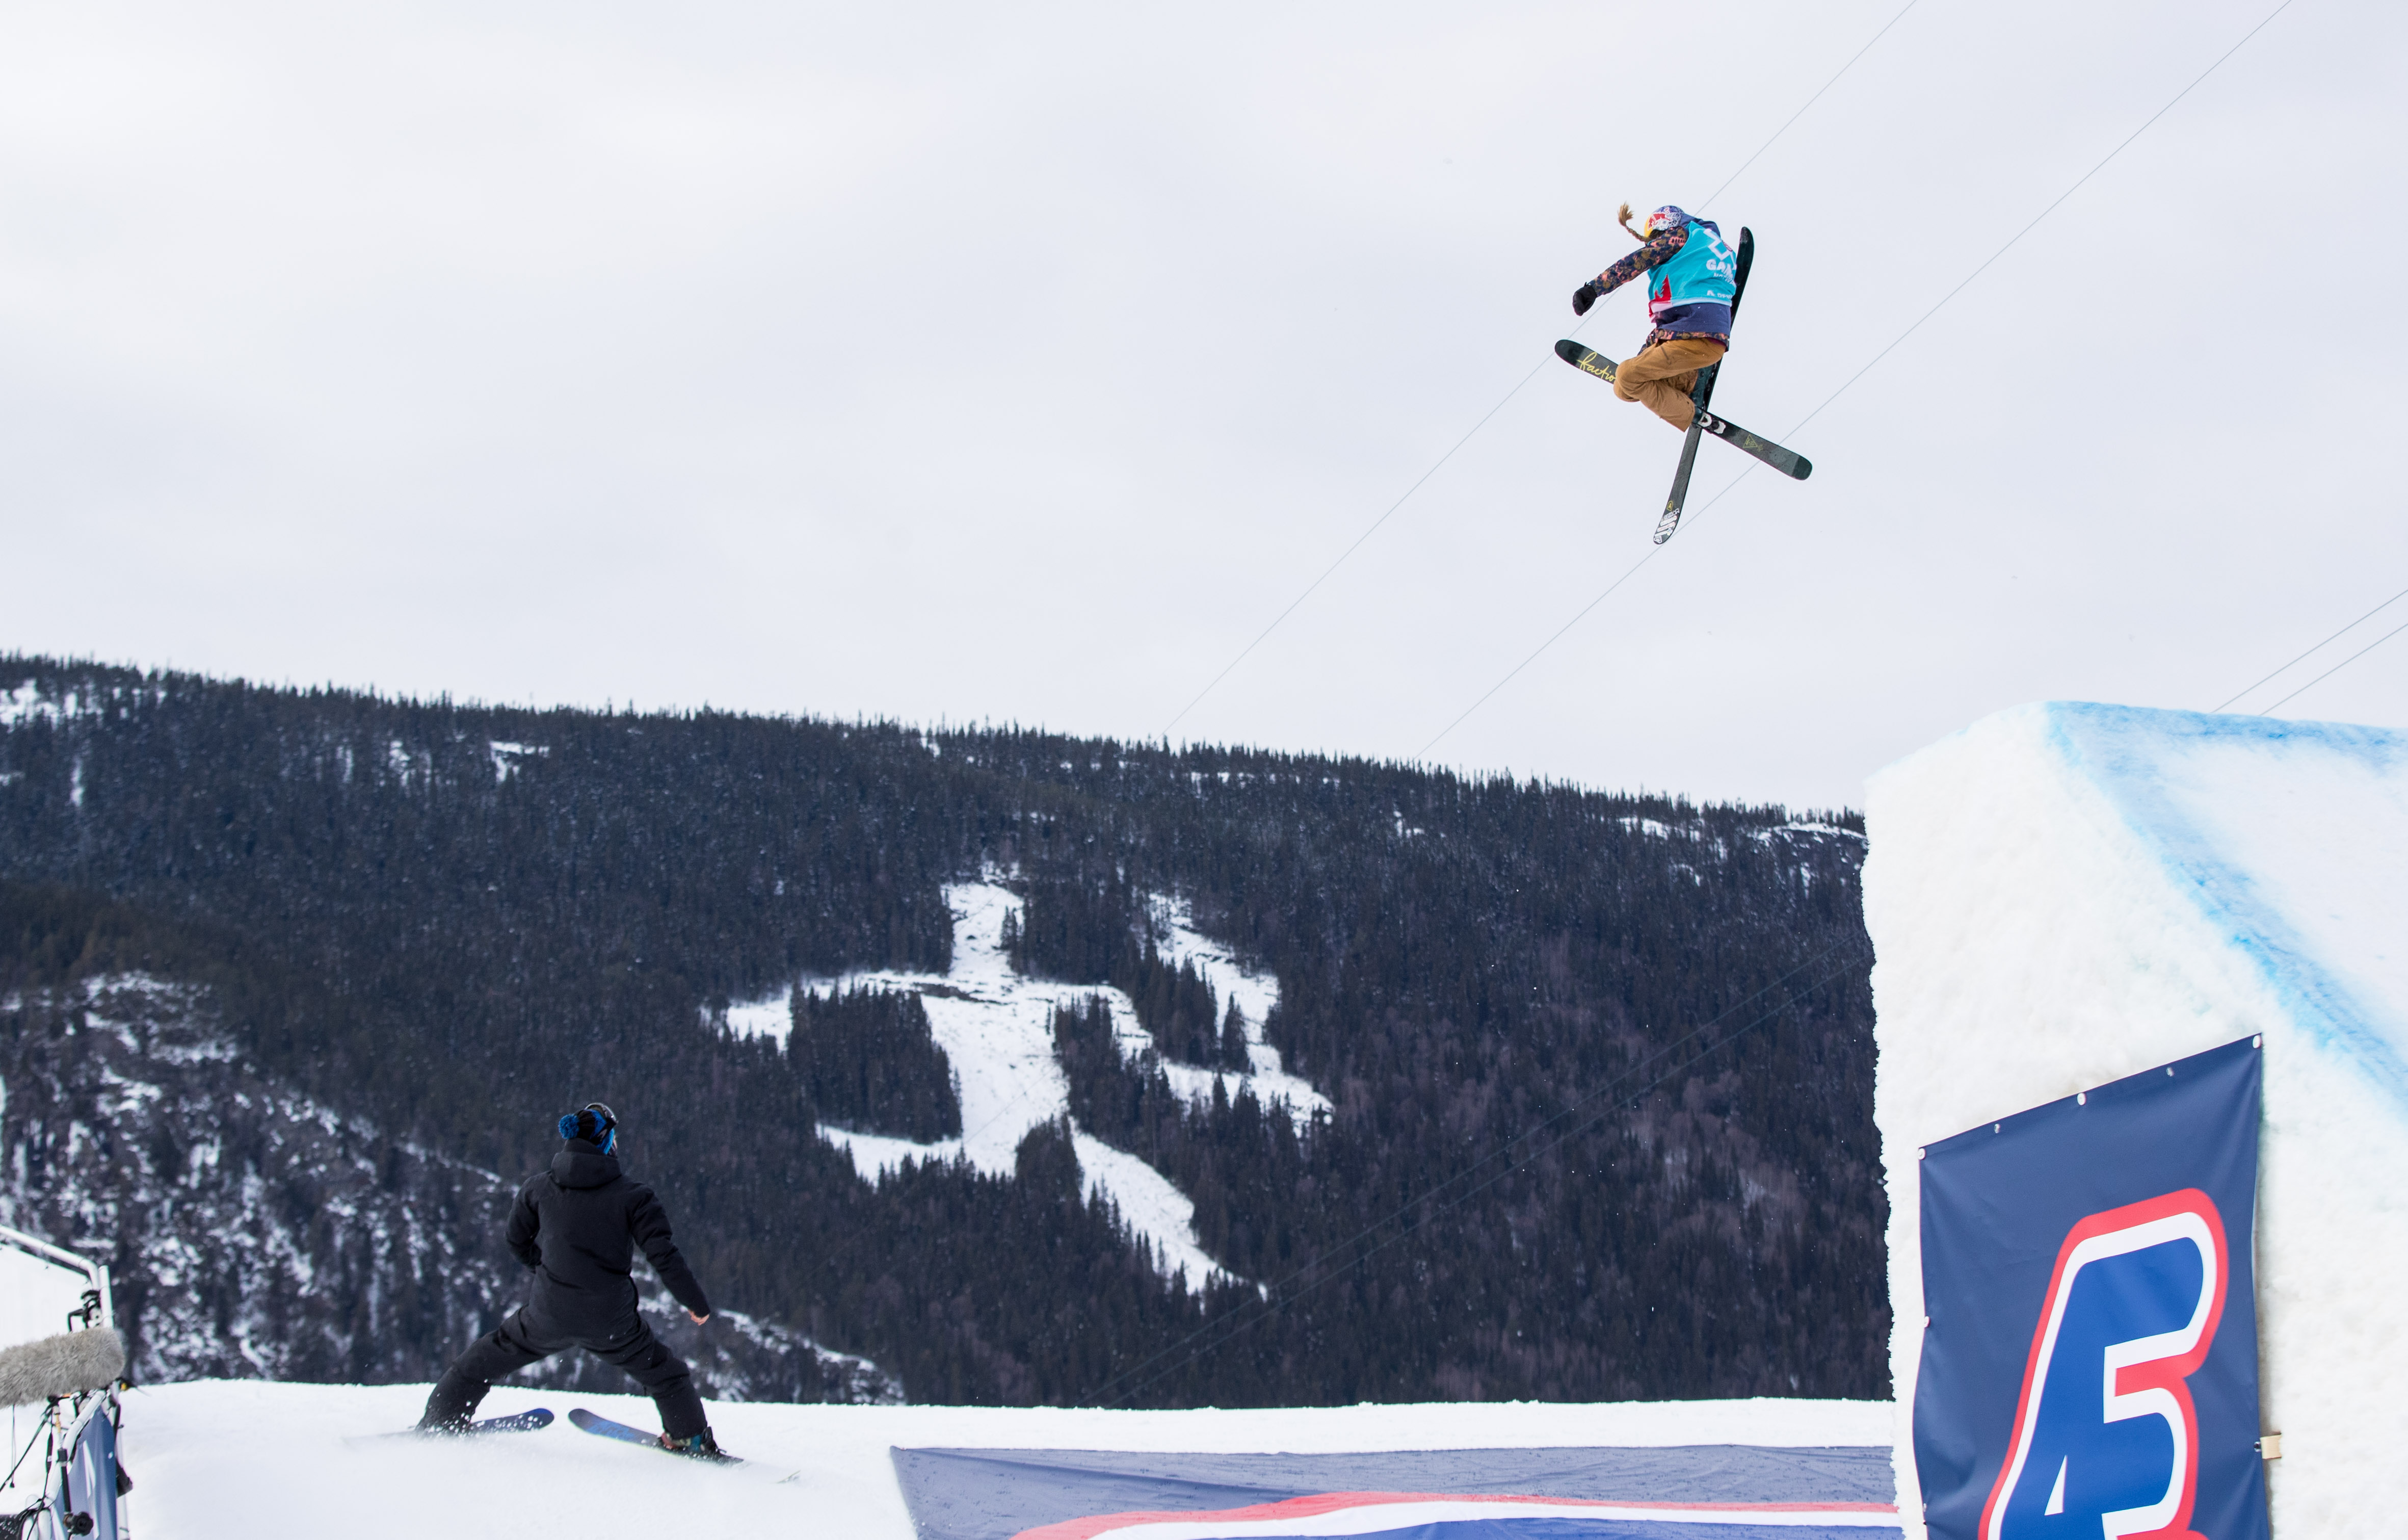 //www.epfl.ee/wordpress/wp-content/uploads/2018/01/sport-nominent-1_Madis-Veltman-300x192.jpg